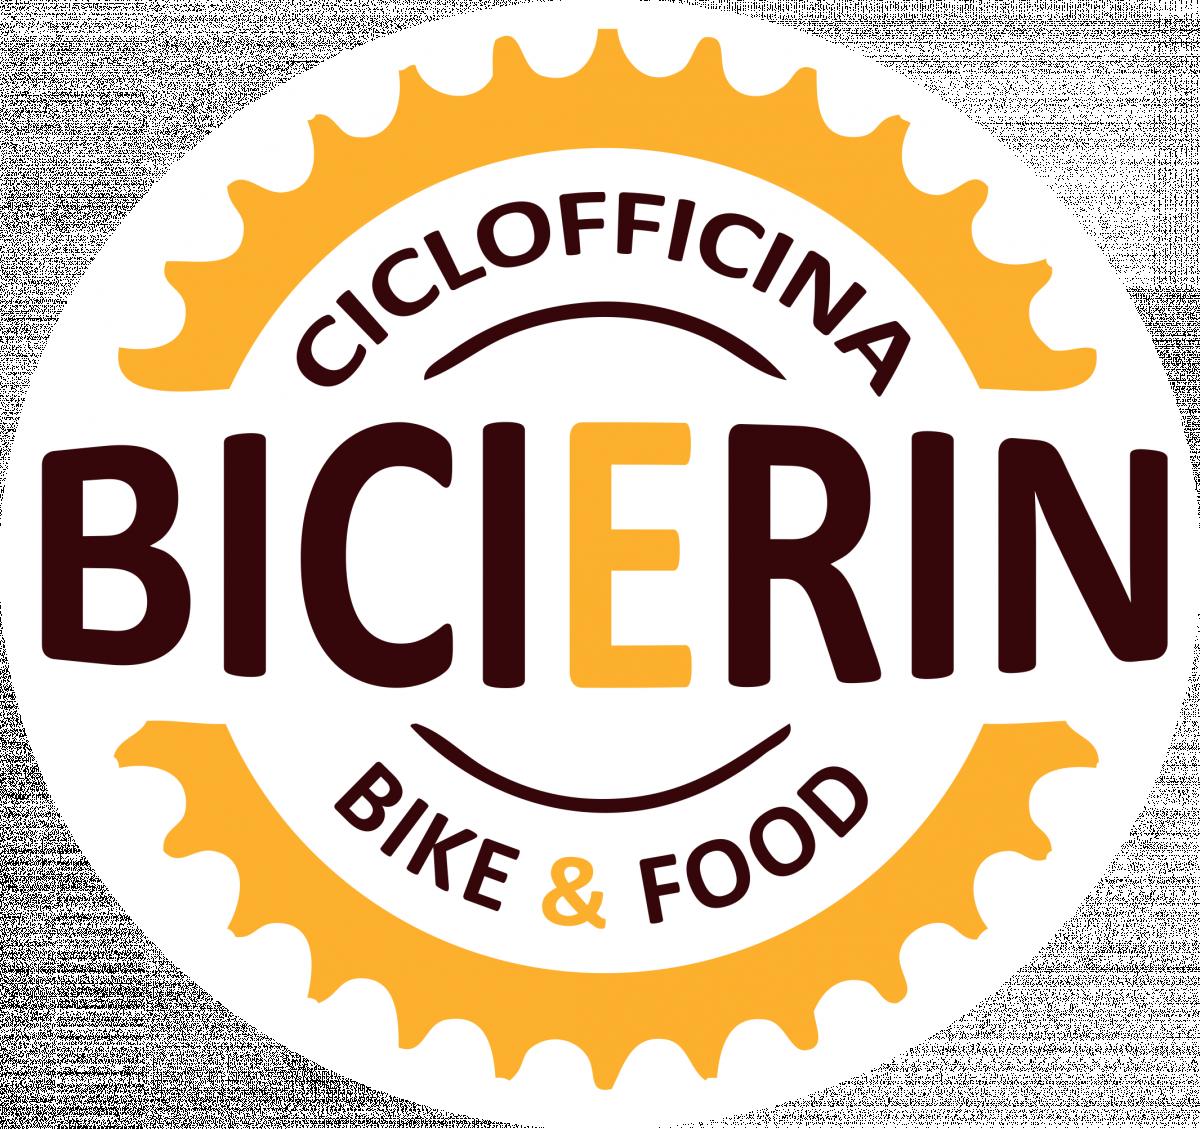 Bike Cafe Srls